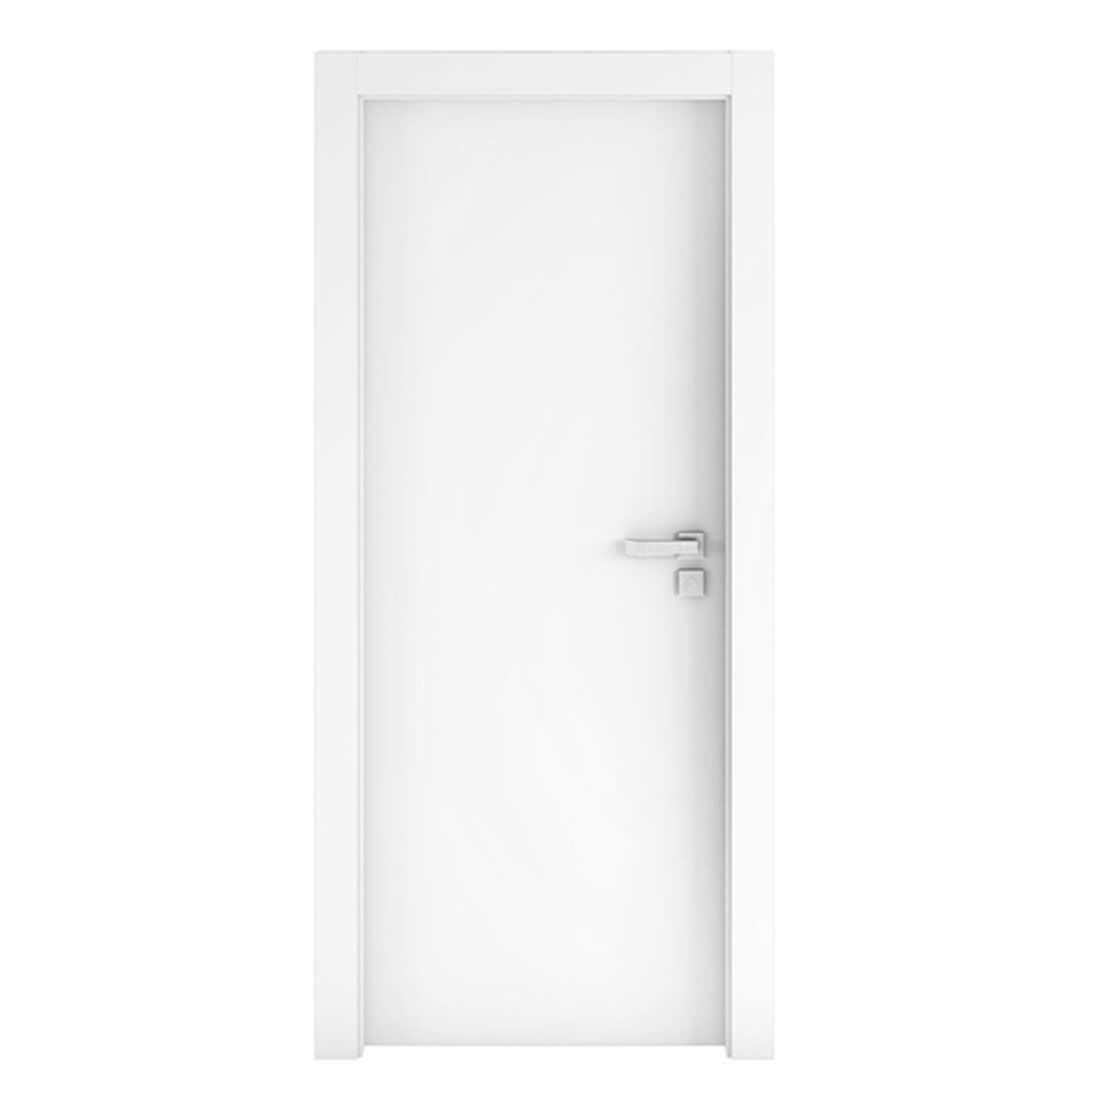 Kit Porta Concrem Wood 2,10 x 0,60 x 3,5 cm Esquerda Branca